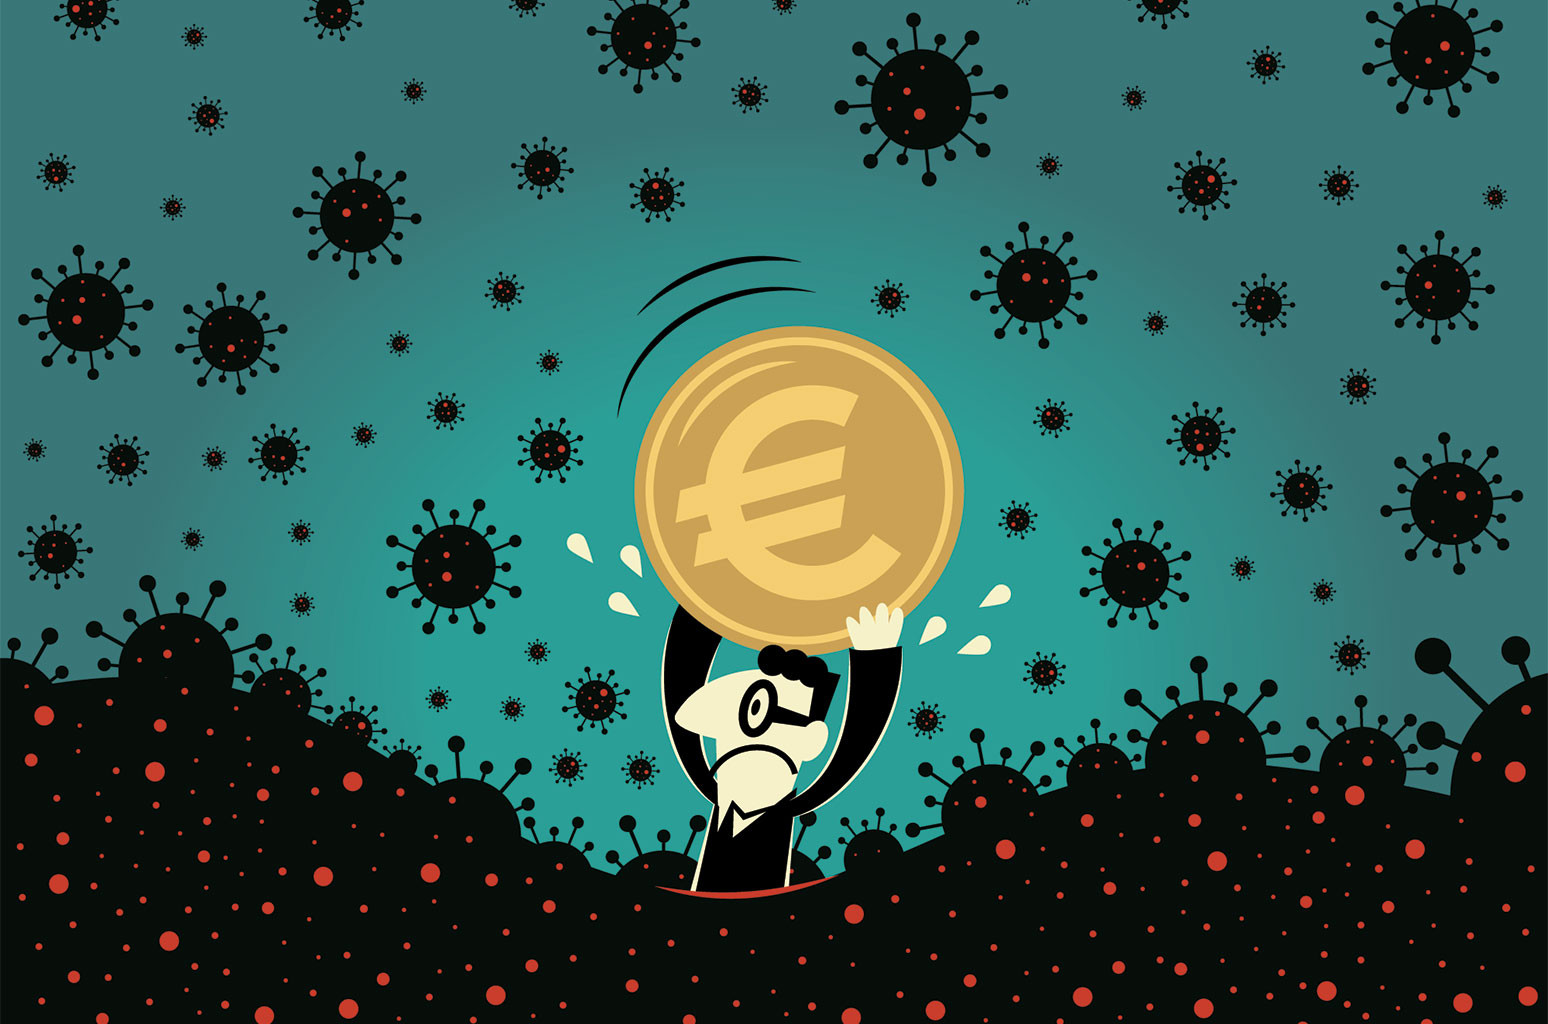 Pandemic financial crisis